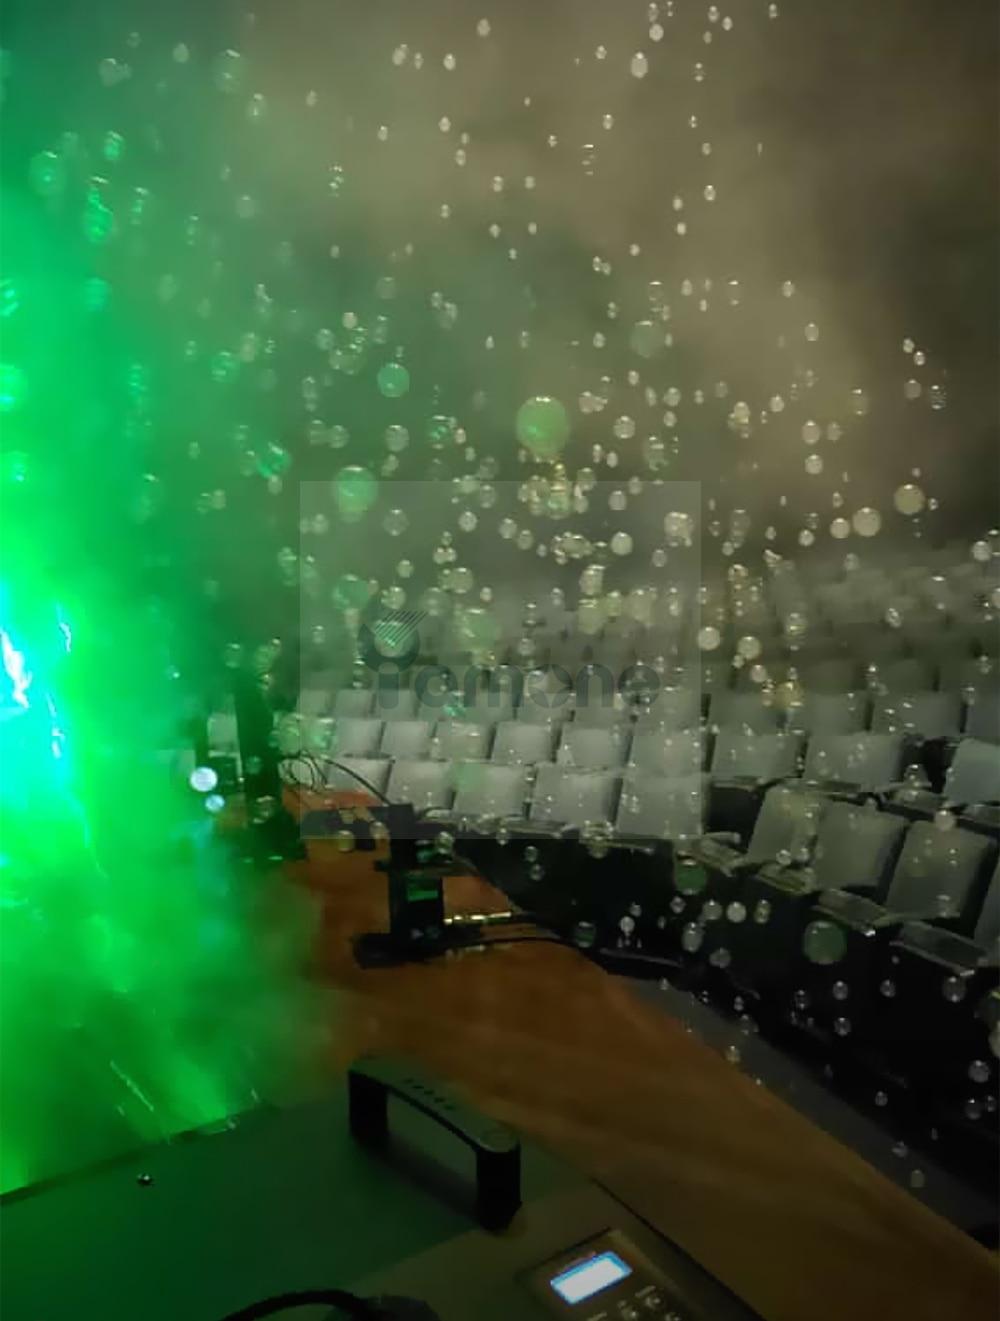 2pcs/Lot 1500W DMX Control RGB Led Bubble Machine With Fog Smoke For Wedding Party 12x3W LED Fogger Maker Machine Bubble Blower